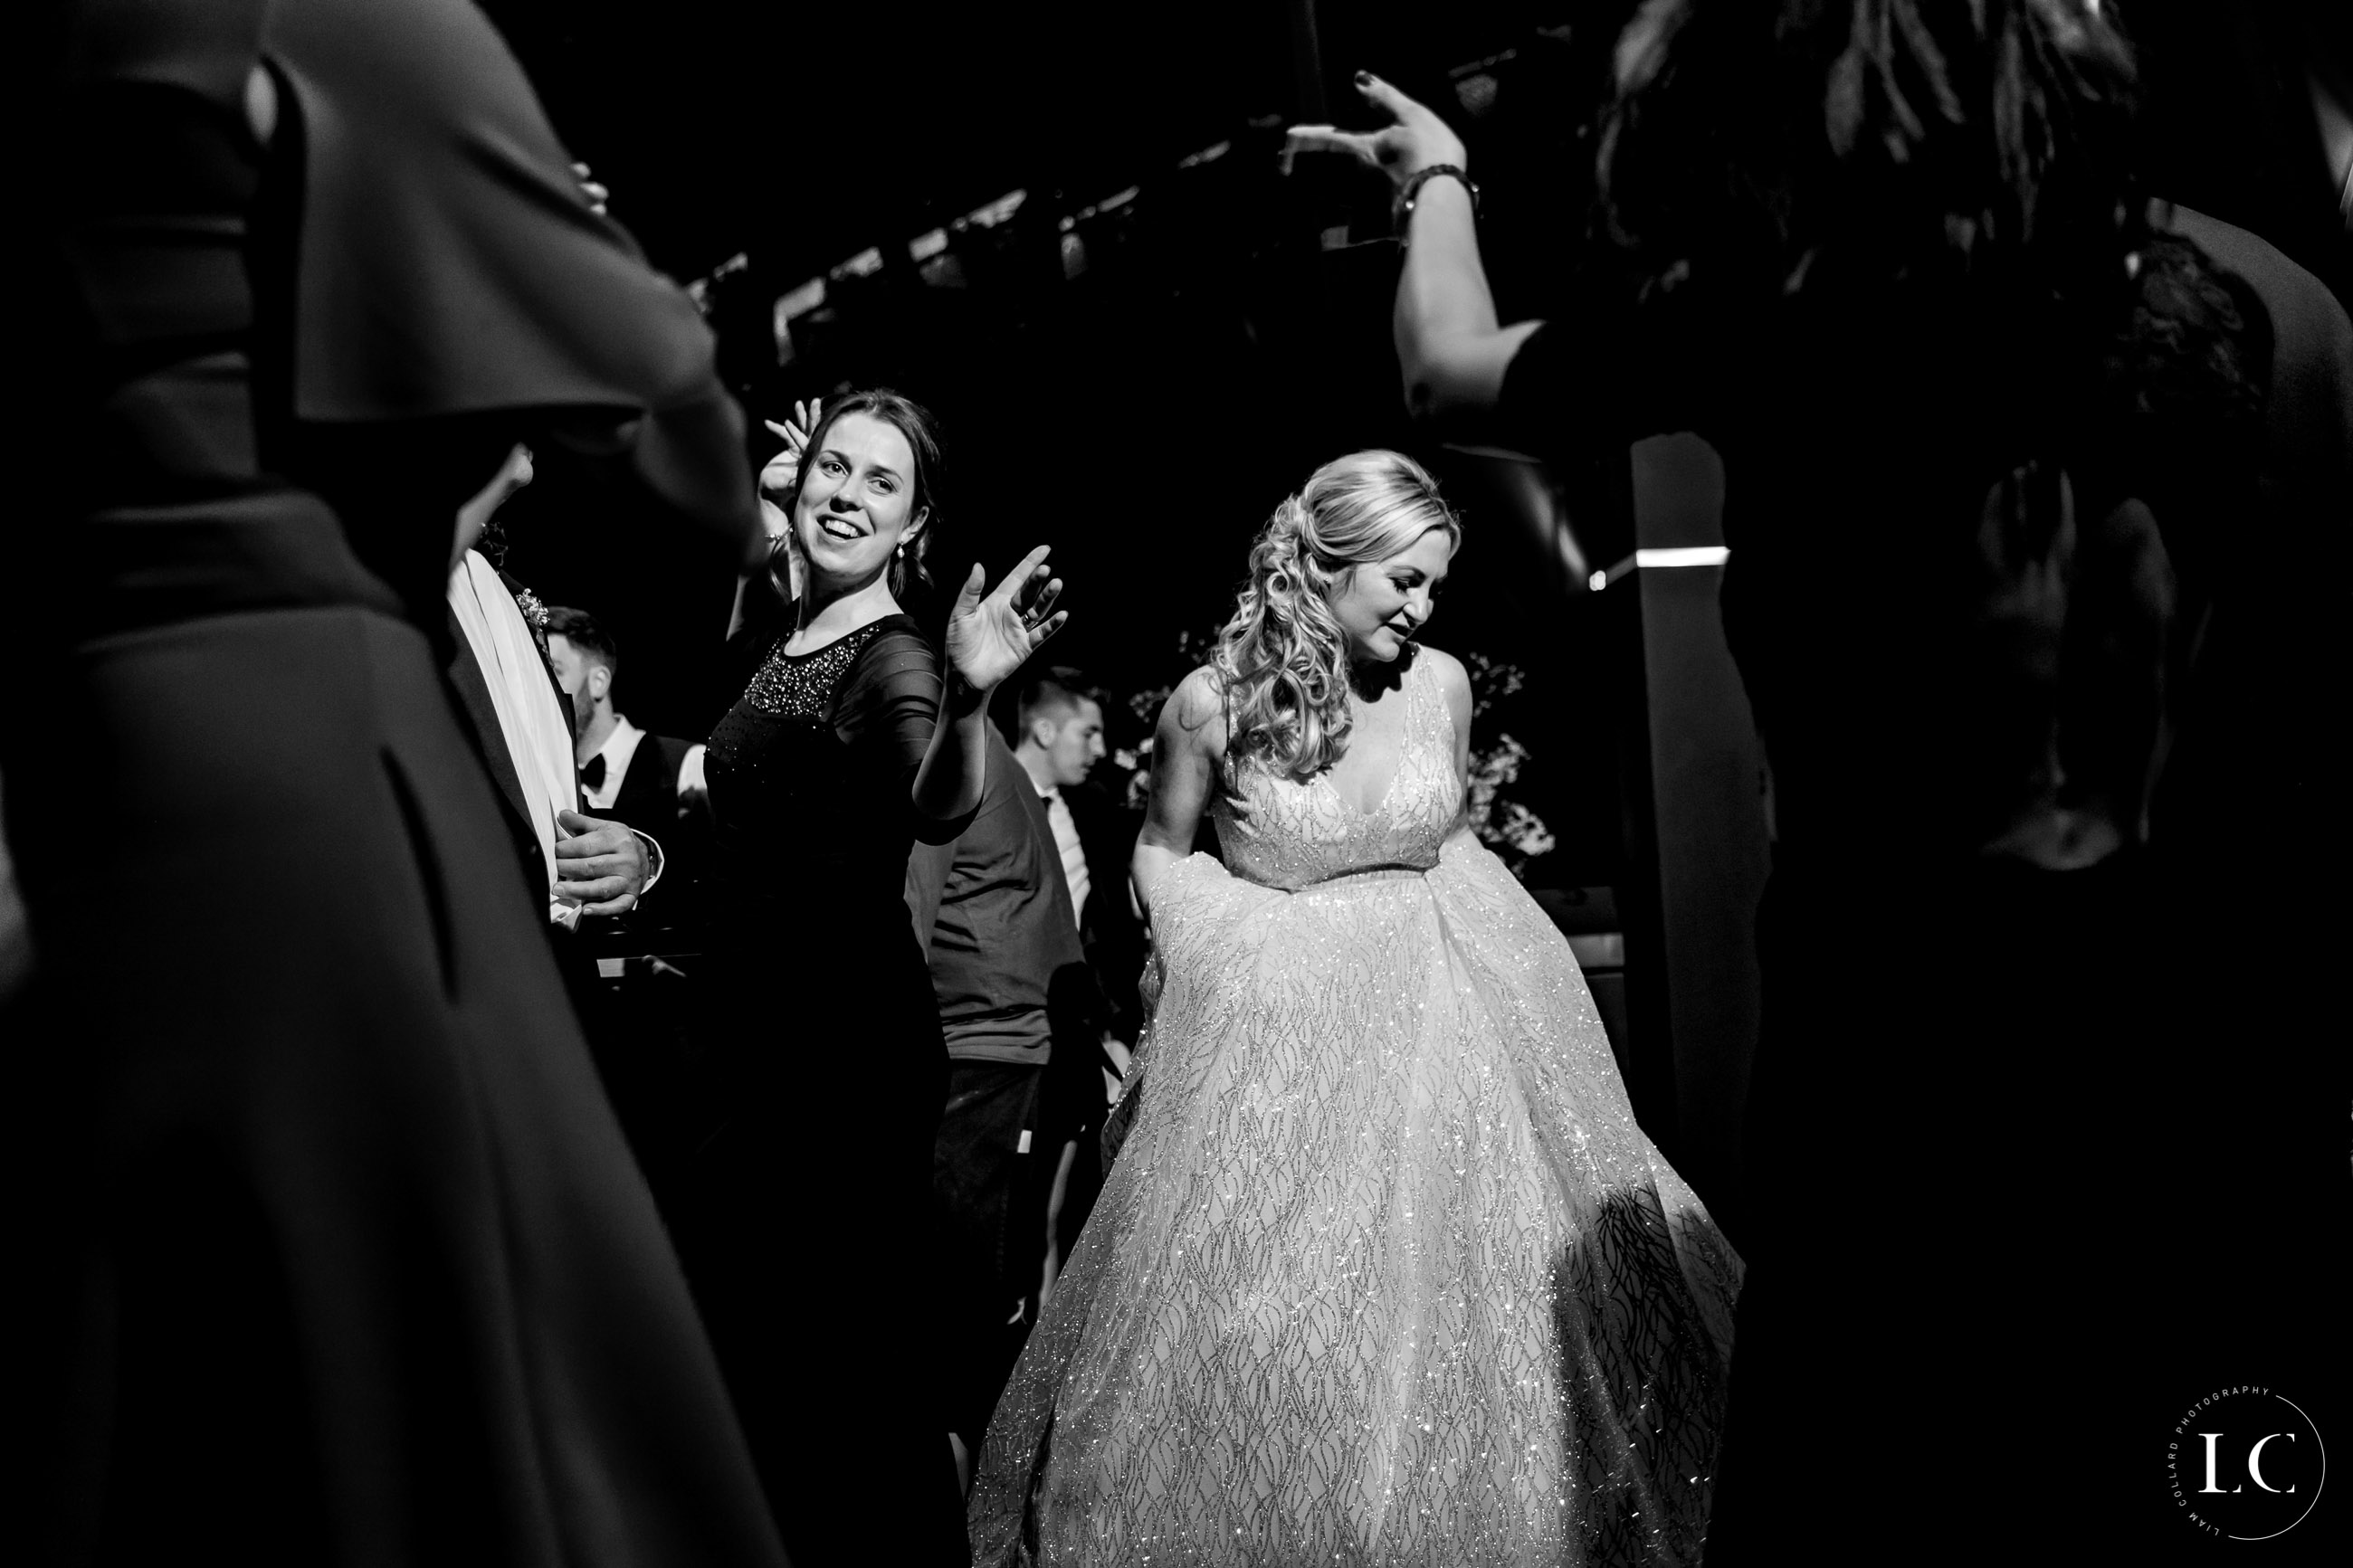 Dancing after wedding